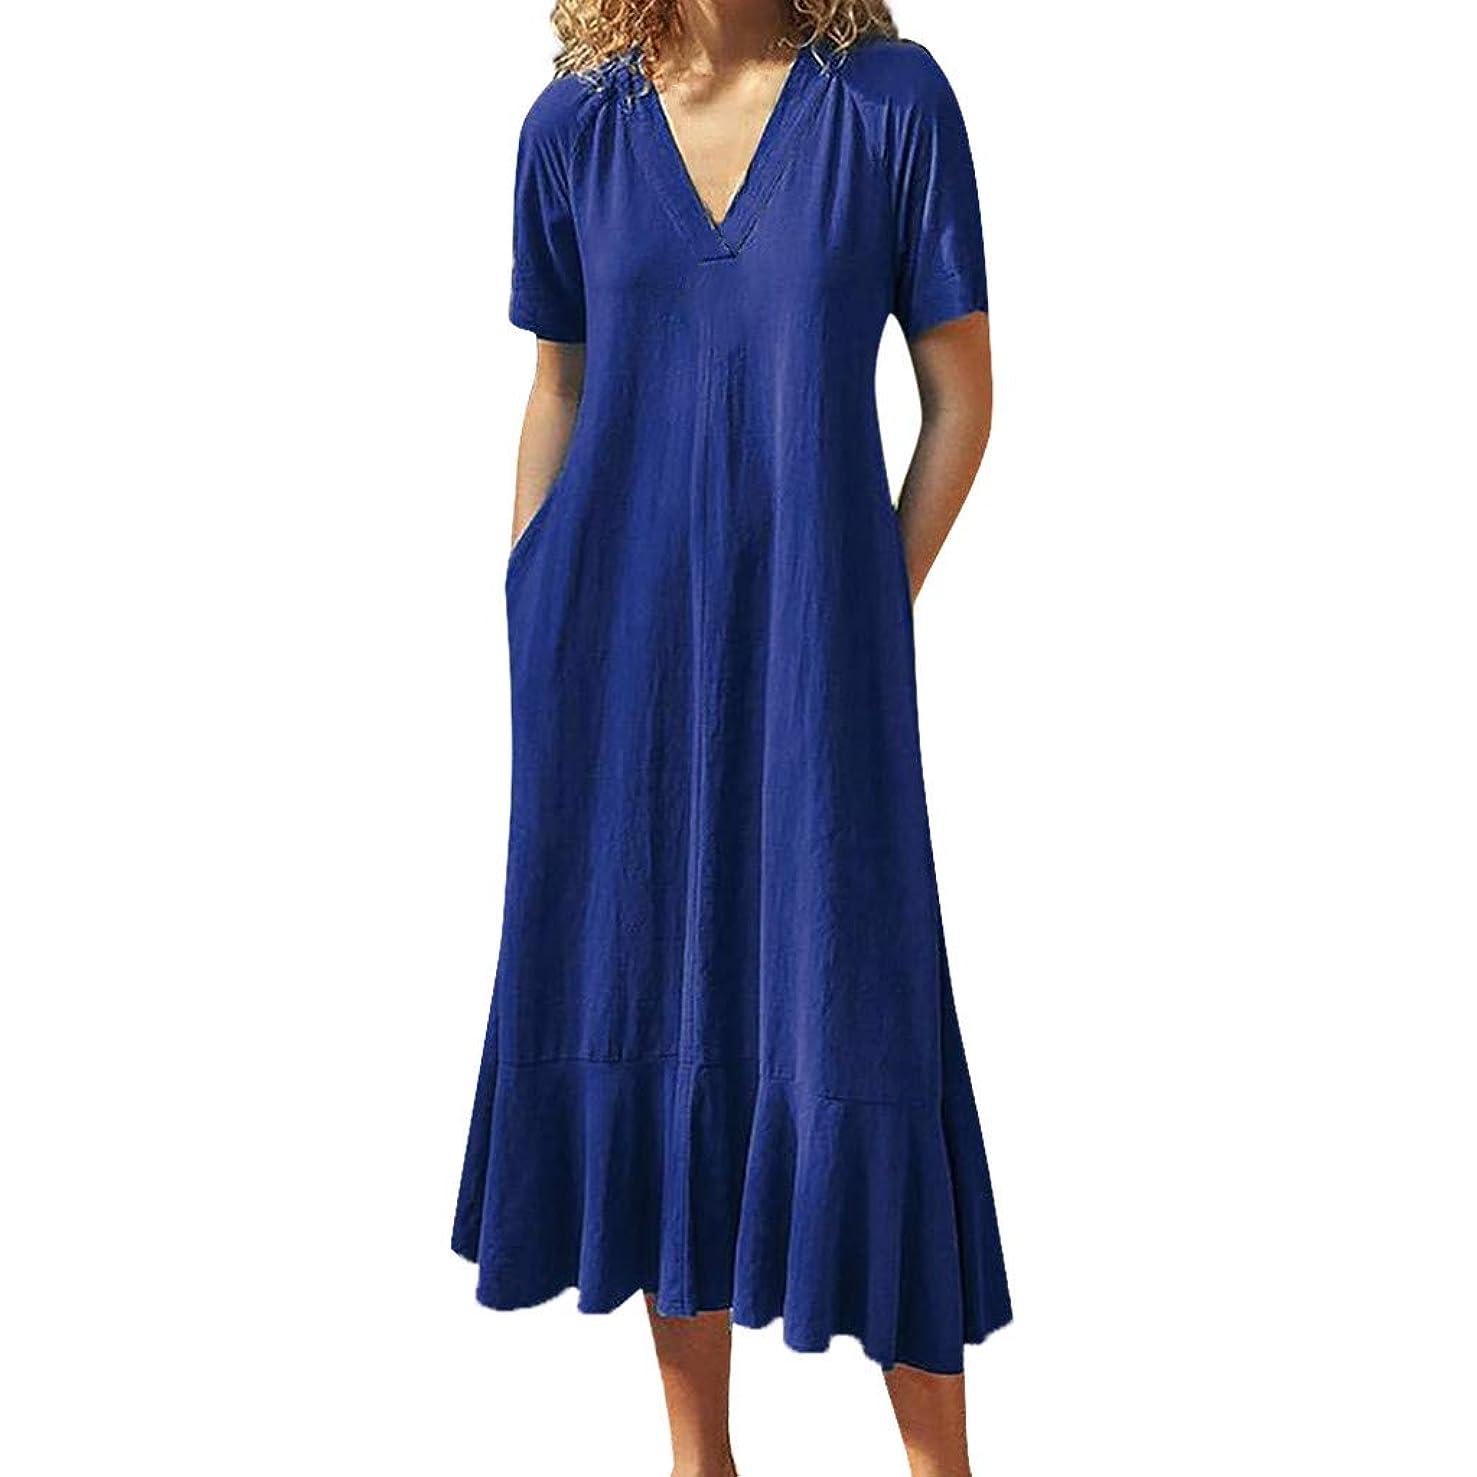 Women Solid Backless Dress Short Sleeve V-Neck Mid-Calf Long Ruffle Dresses